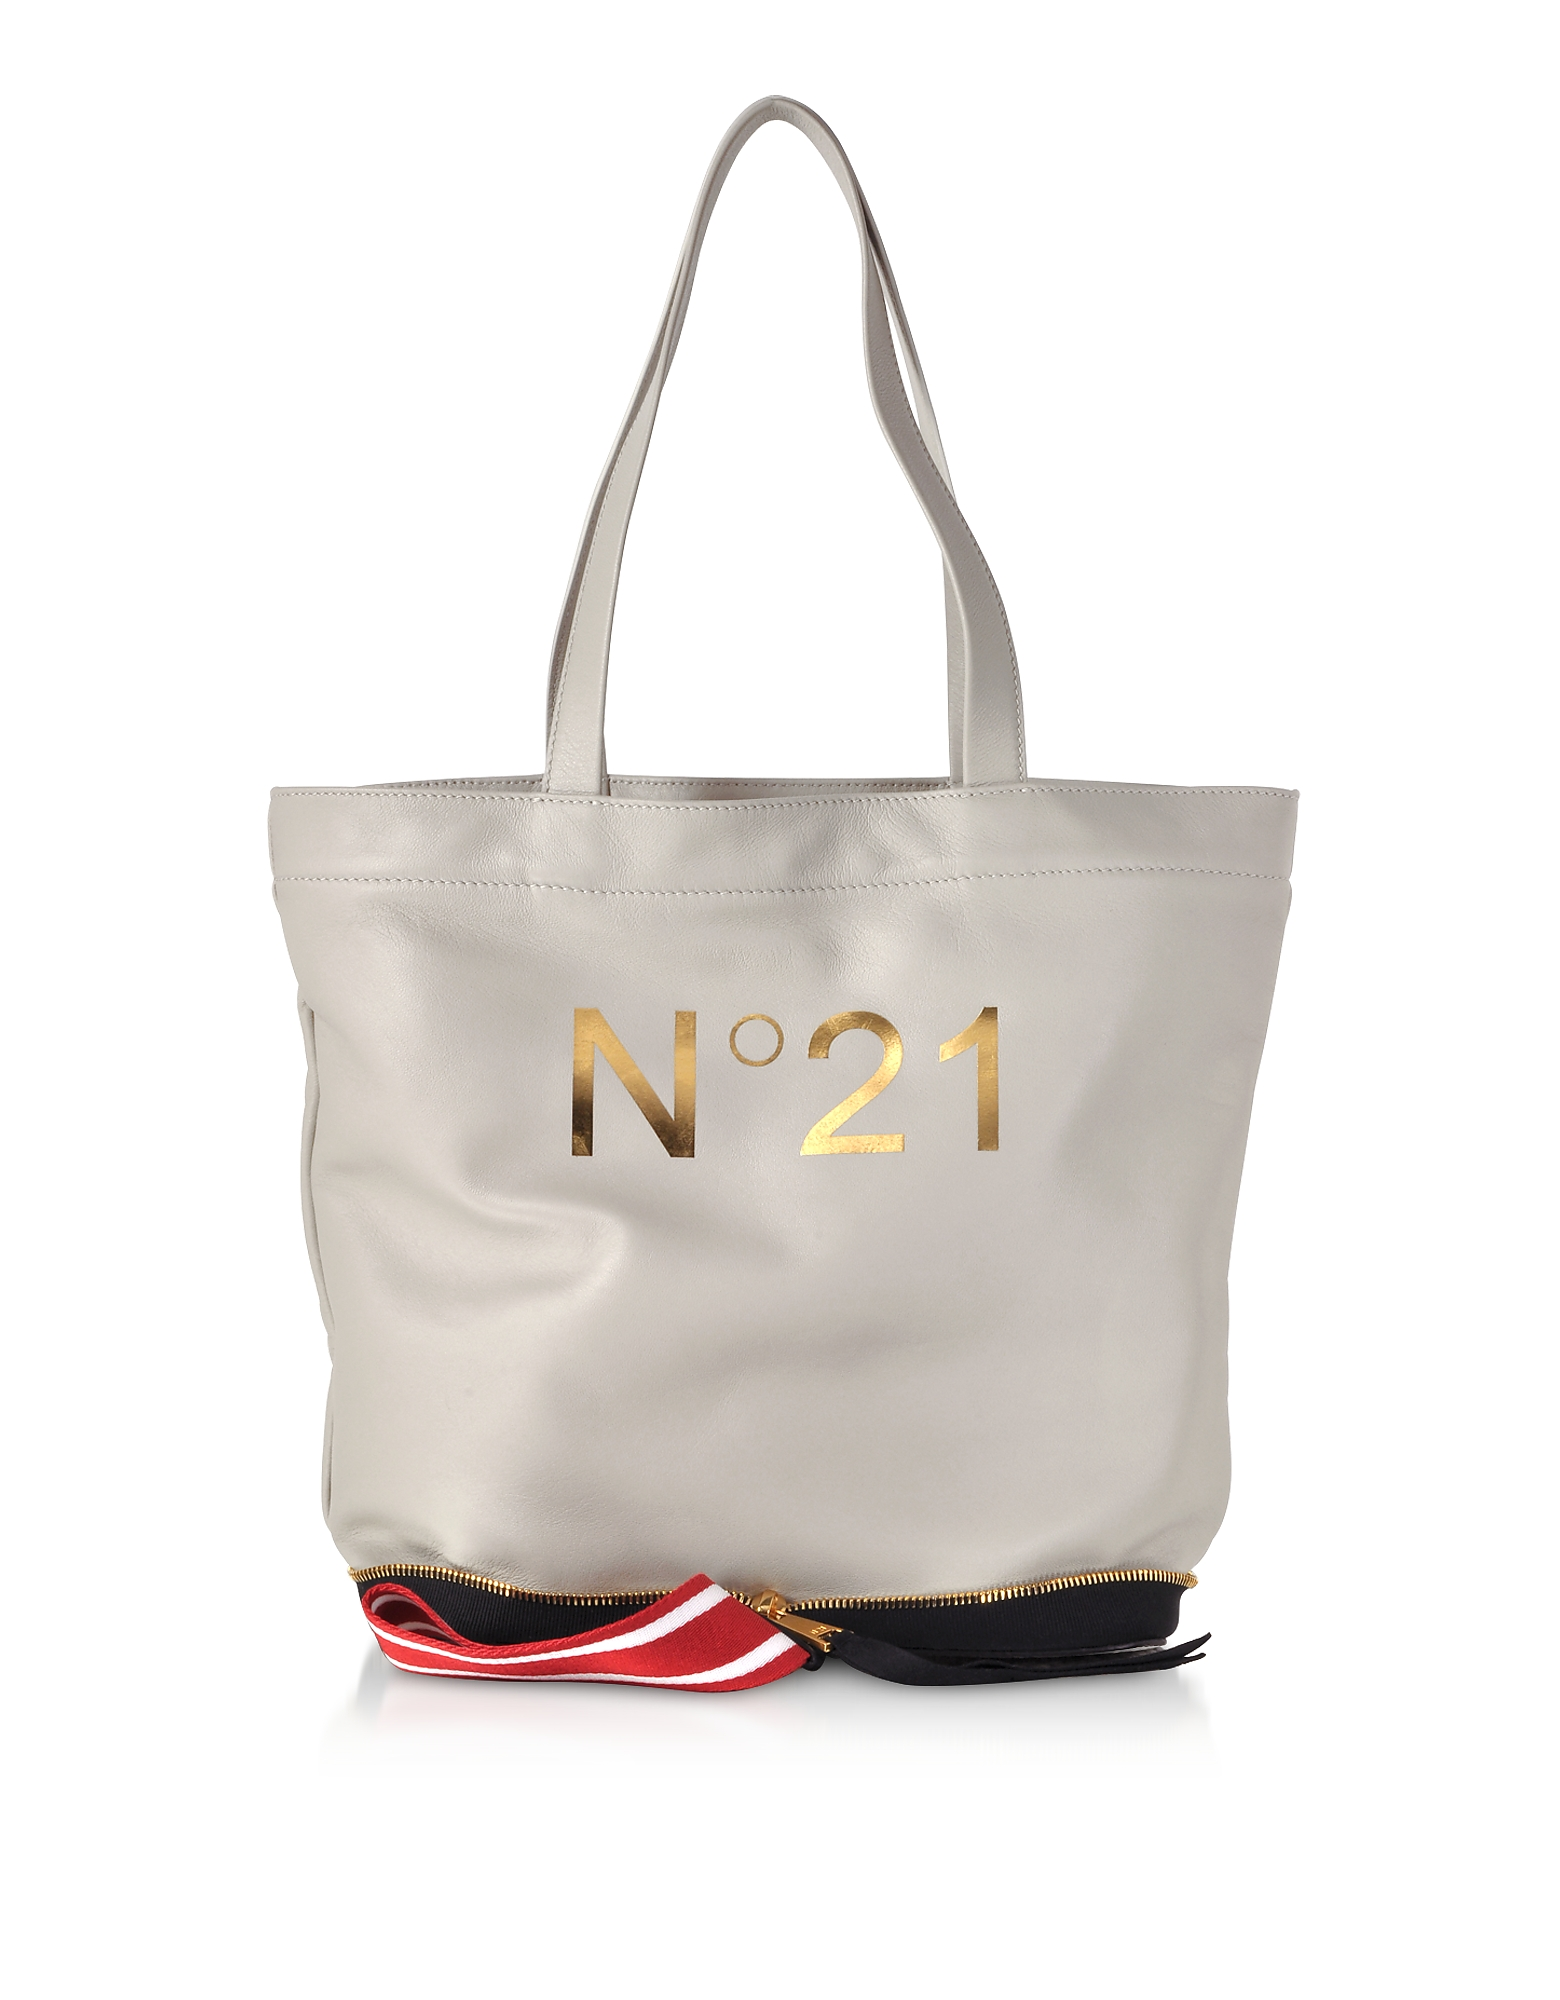 N°21 Handbags, Ice Small Foldable Shopping Bag